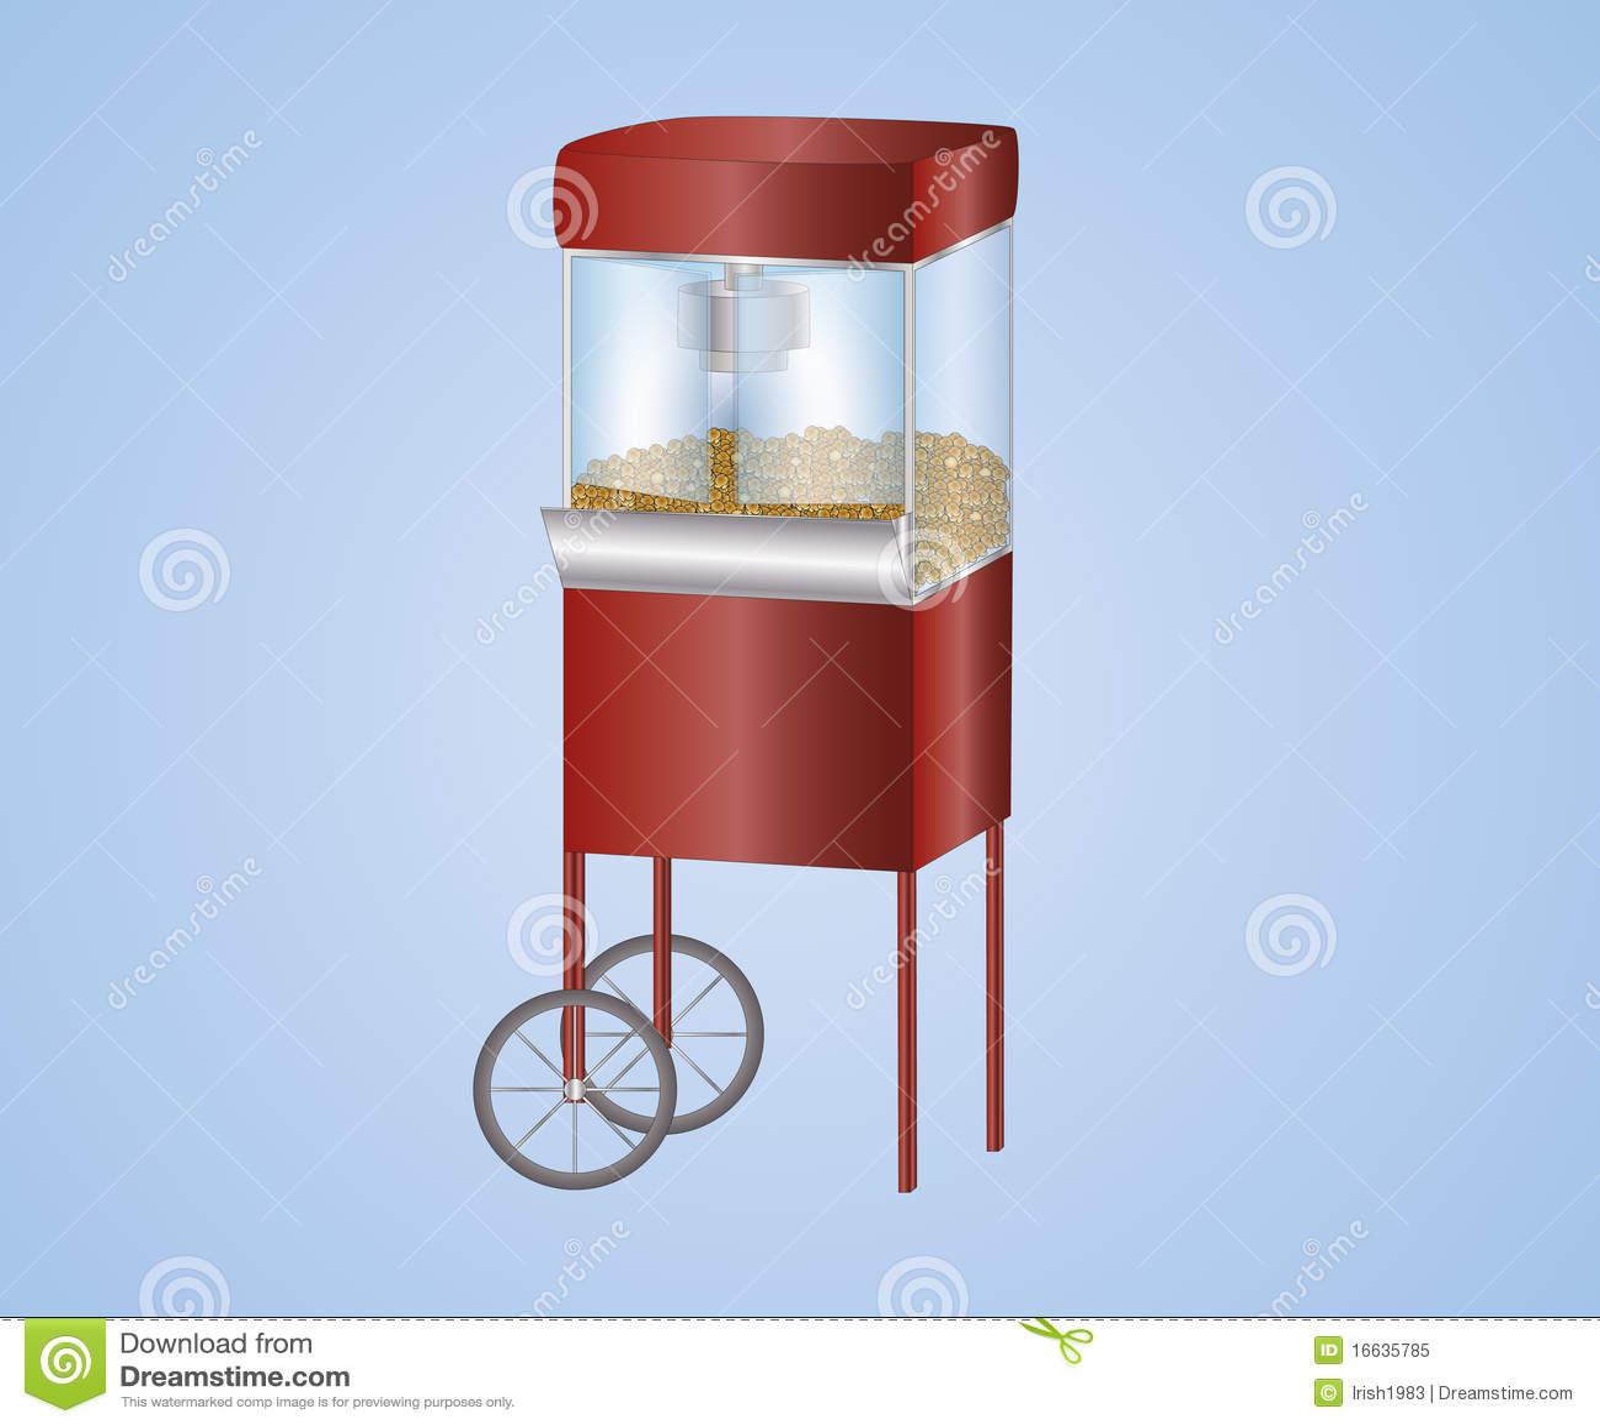 images of popcorn machine